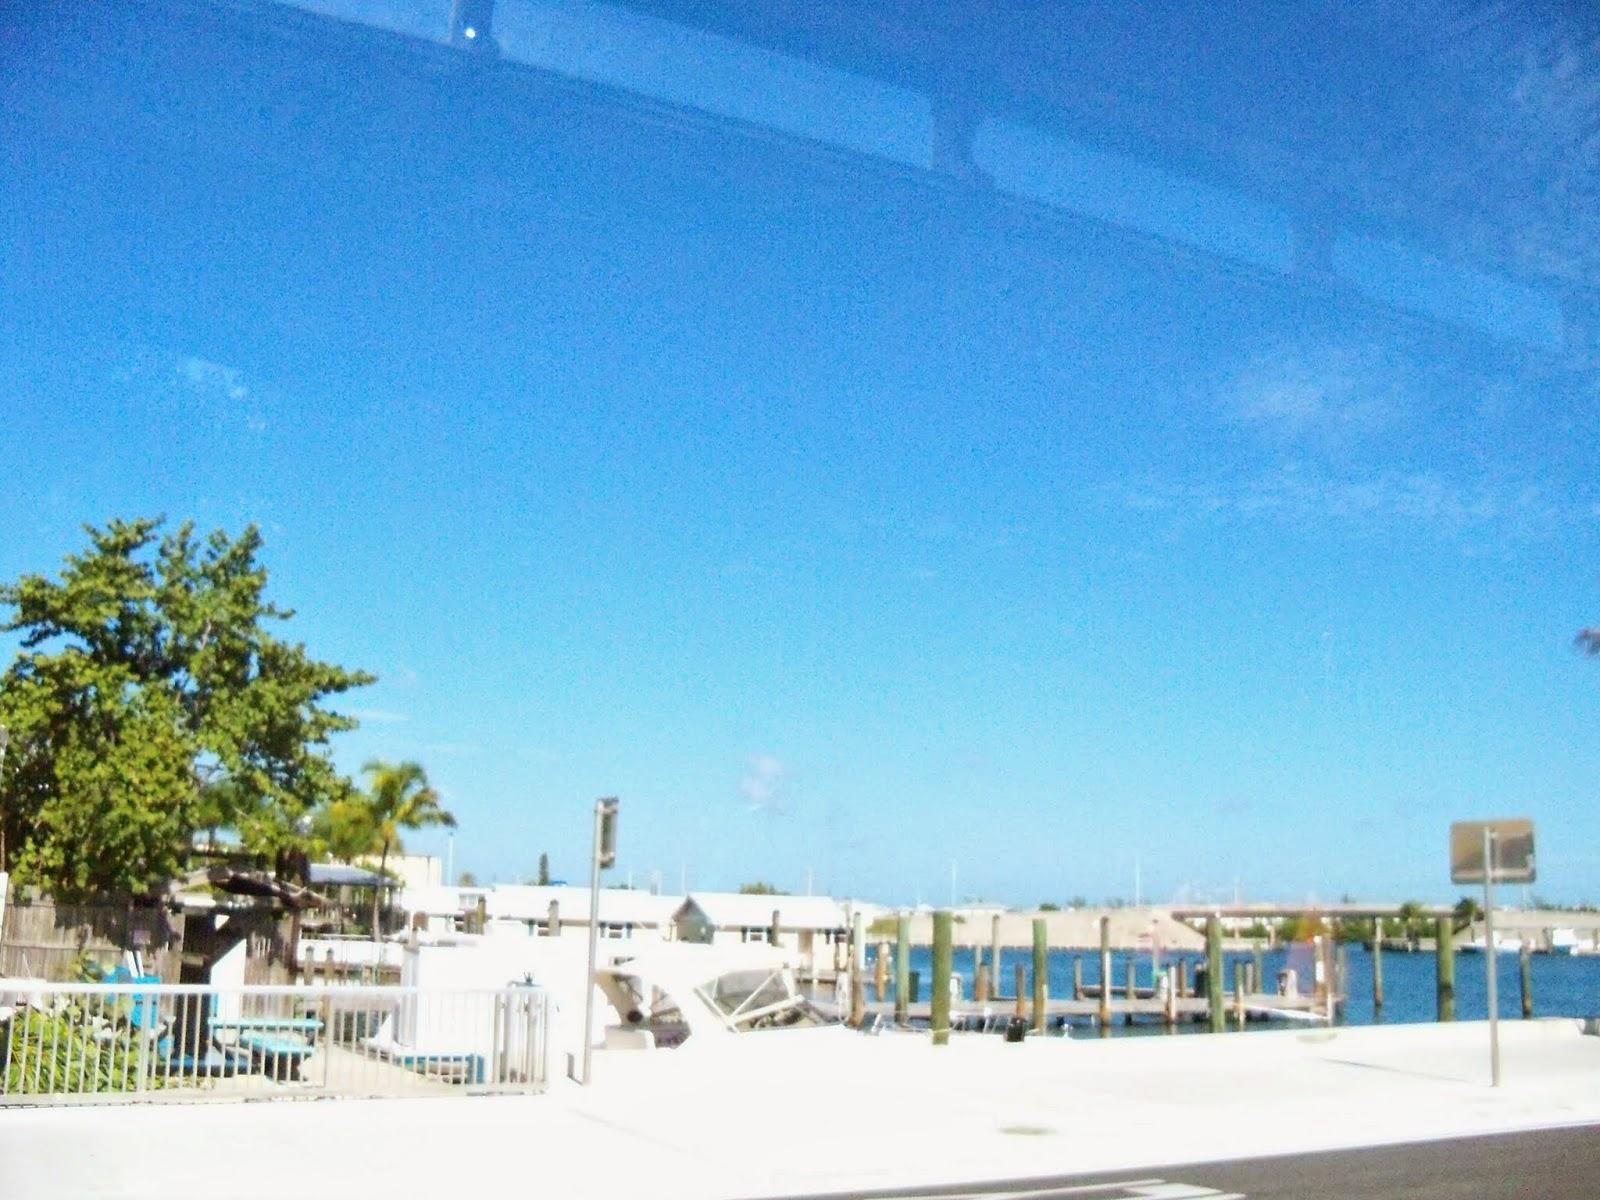 Key West Vacation - 116_5758.JPG